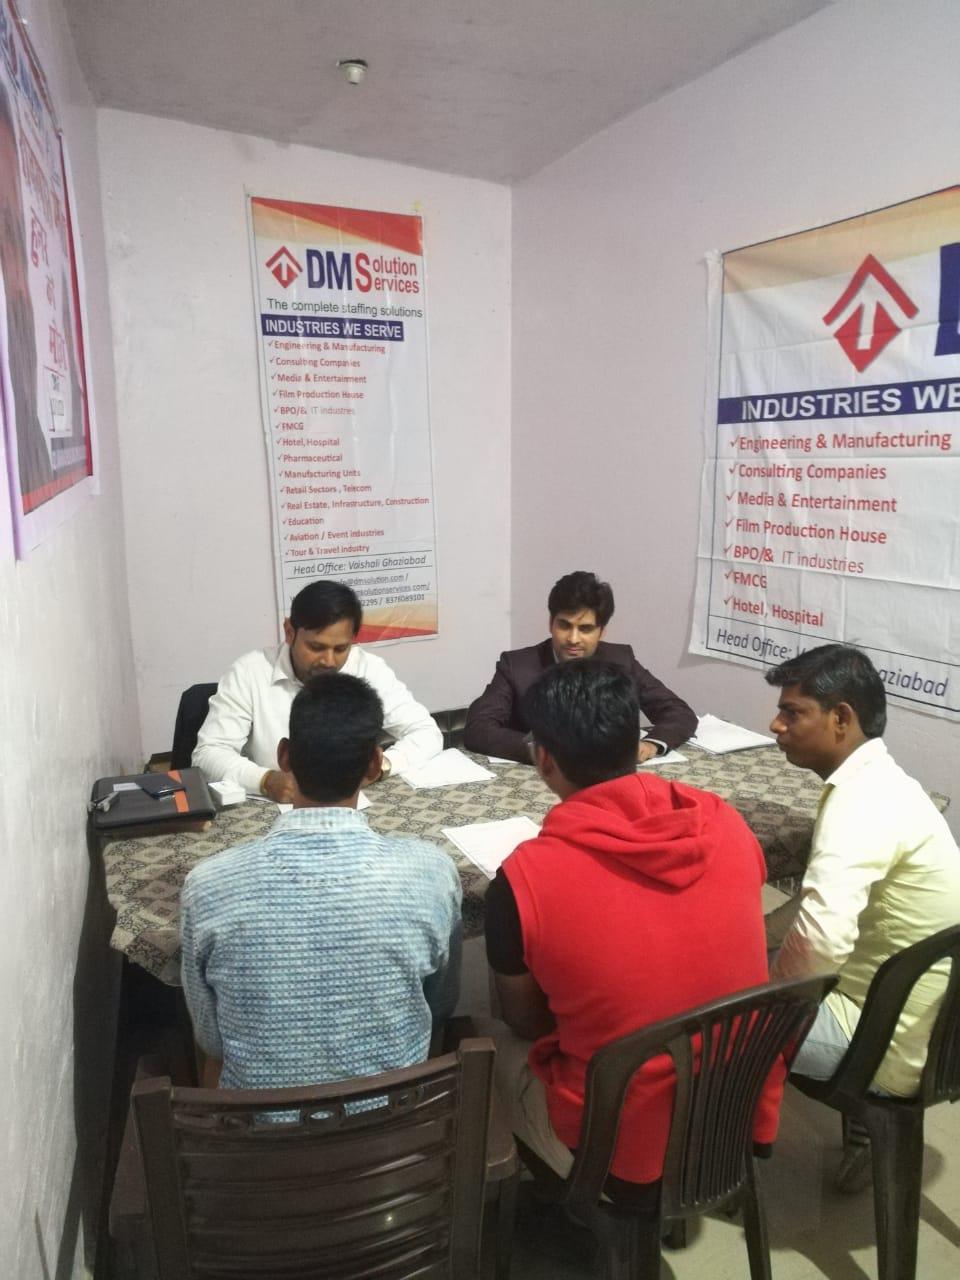 DM Solution Services in Vaishali, Ghaziabad-201010 | Sulekha